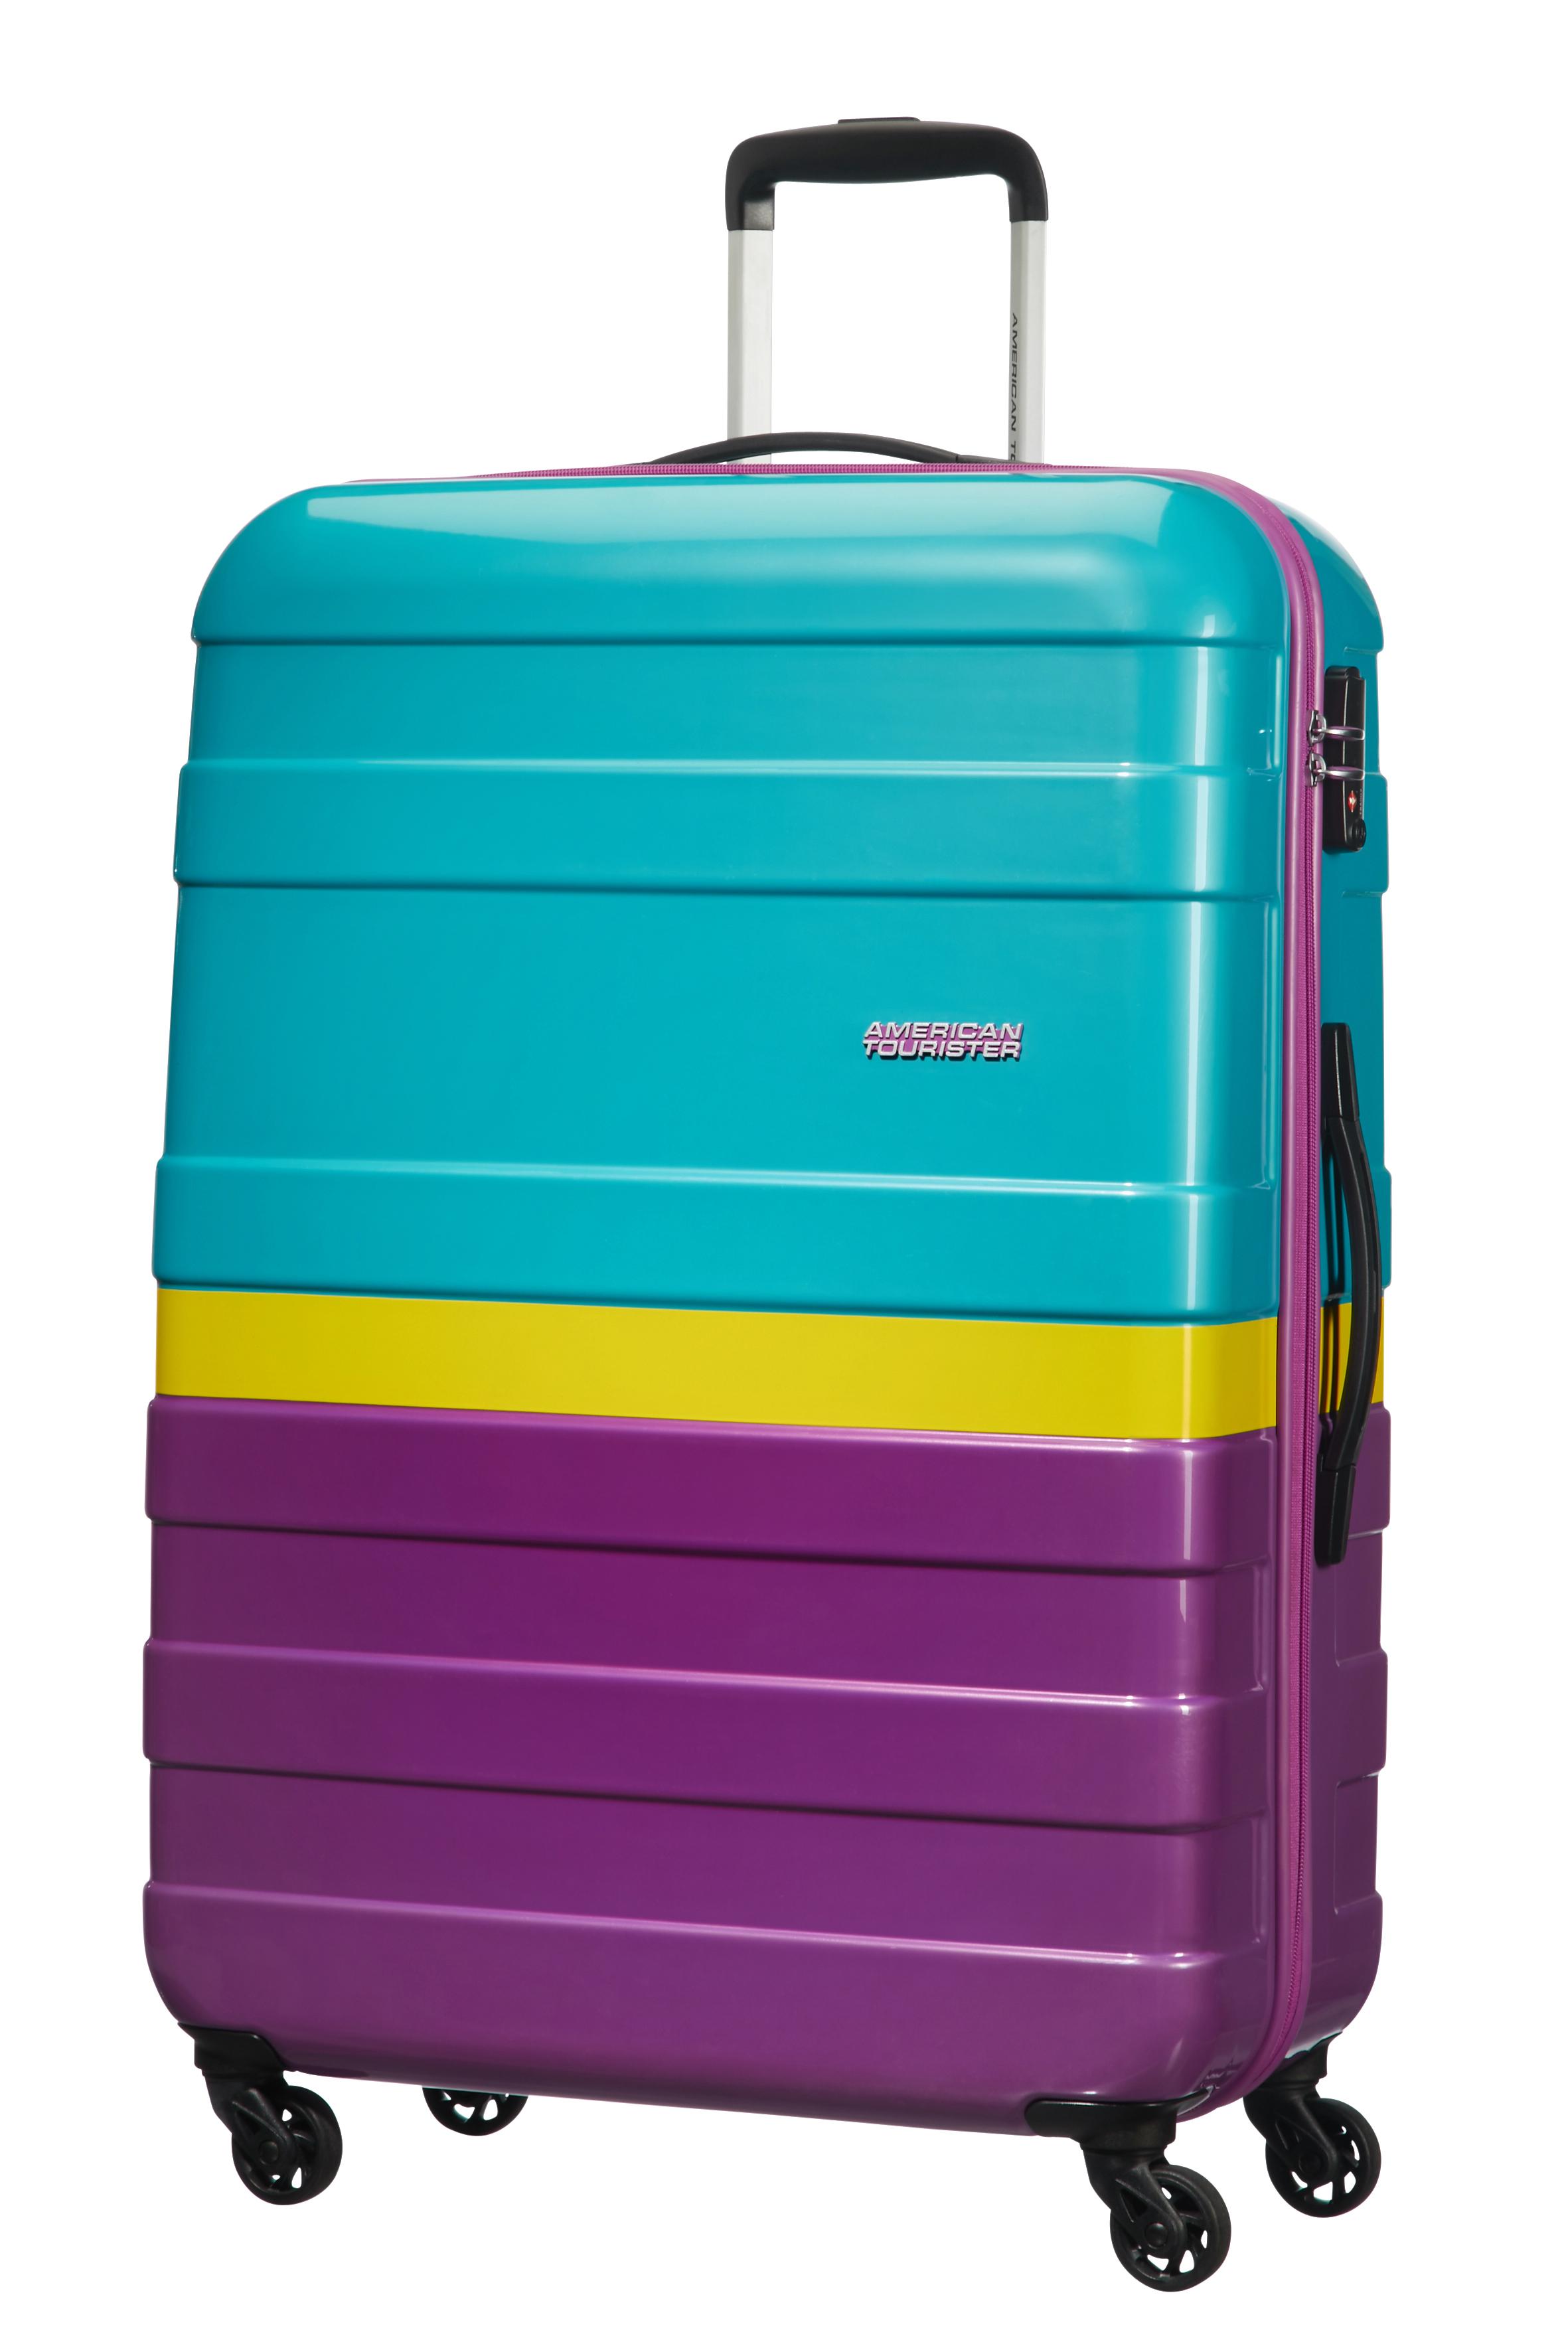 valise american tourister 20 valises pour voyager styl elle. Black Bedroom Furniture Sets. Home Design Ideas